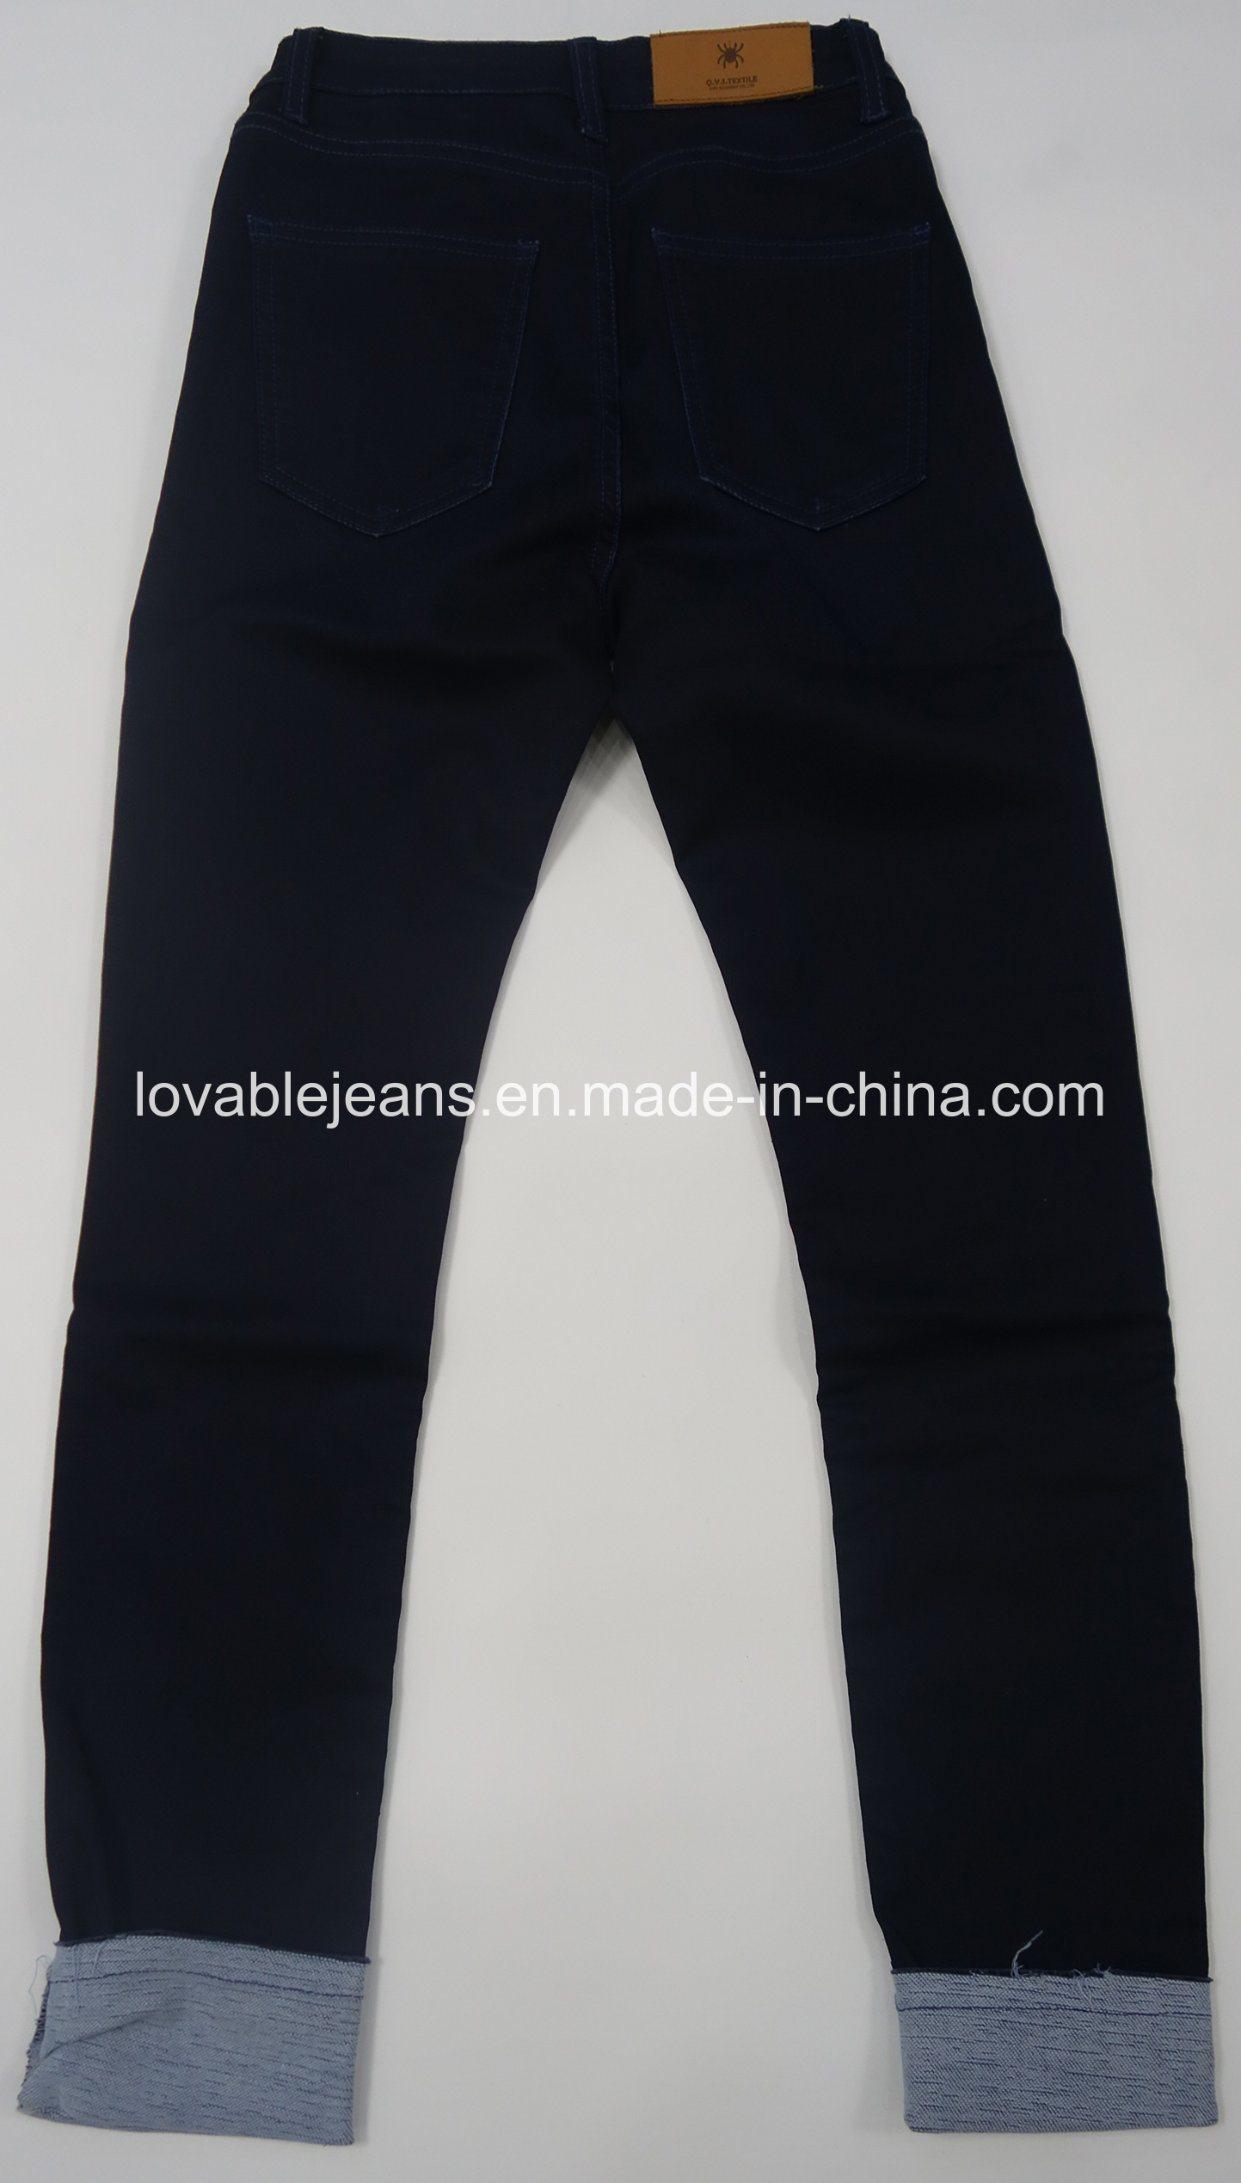 8.6oz Dark Blue Skinny Women Jeans (HYQ73-05TPA)